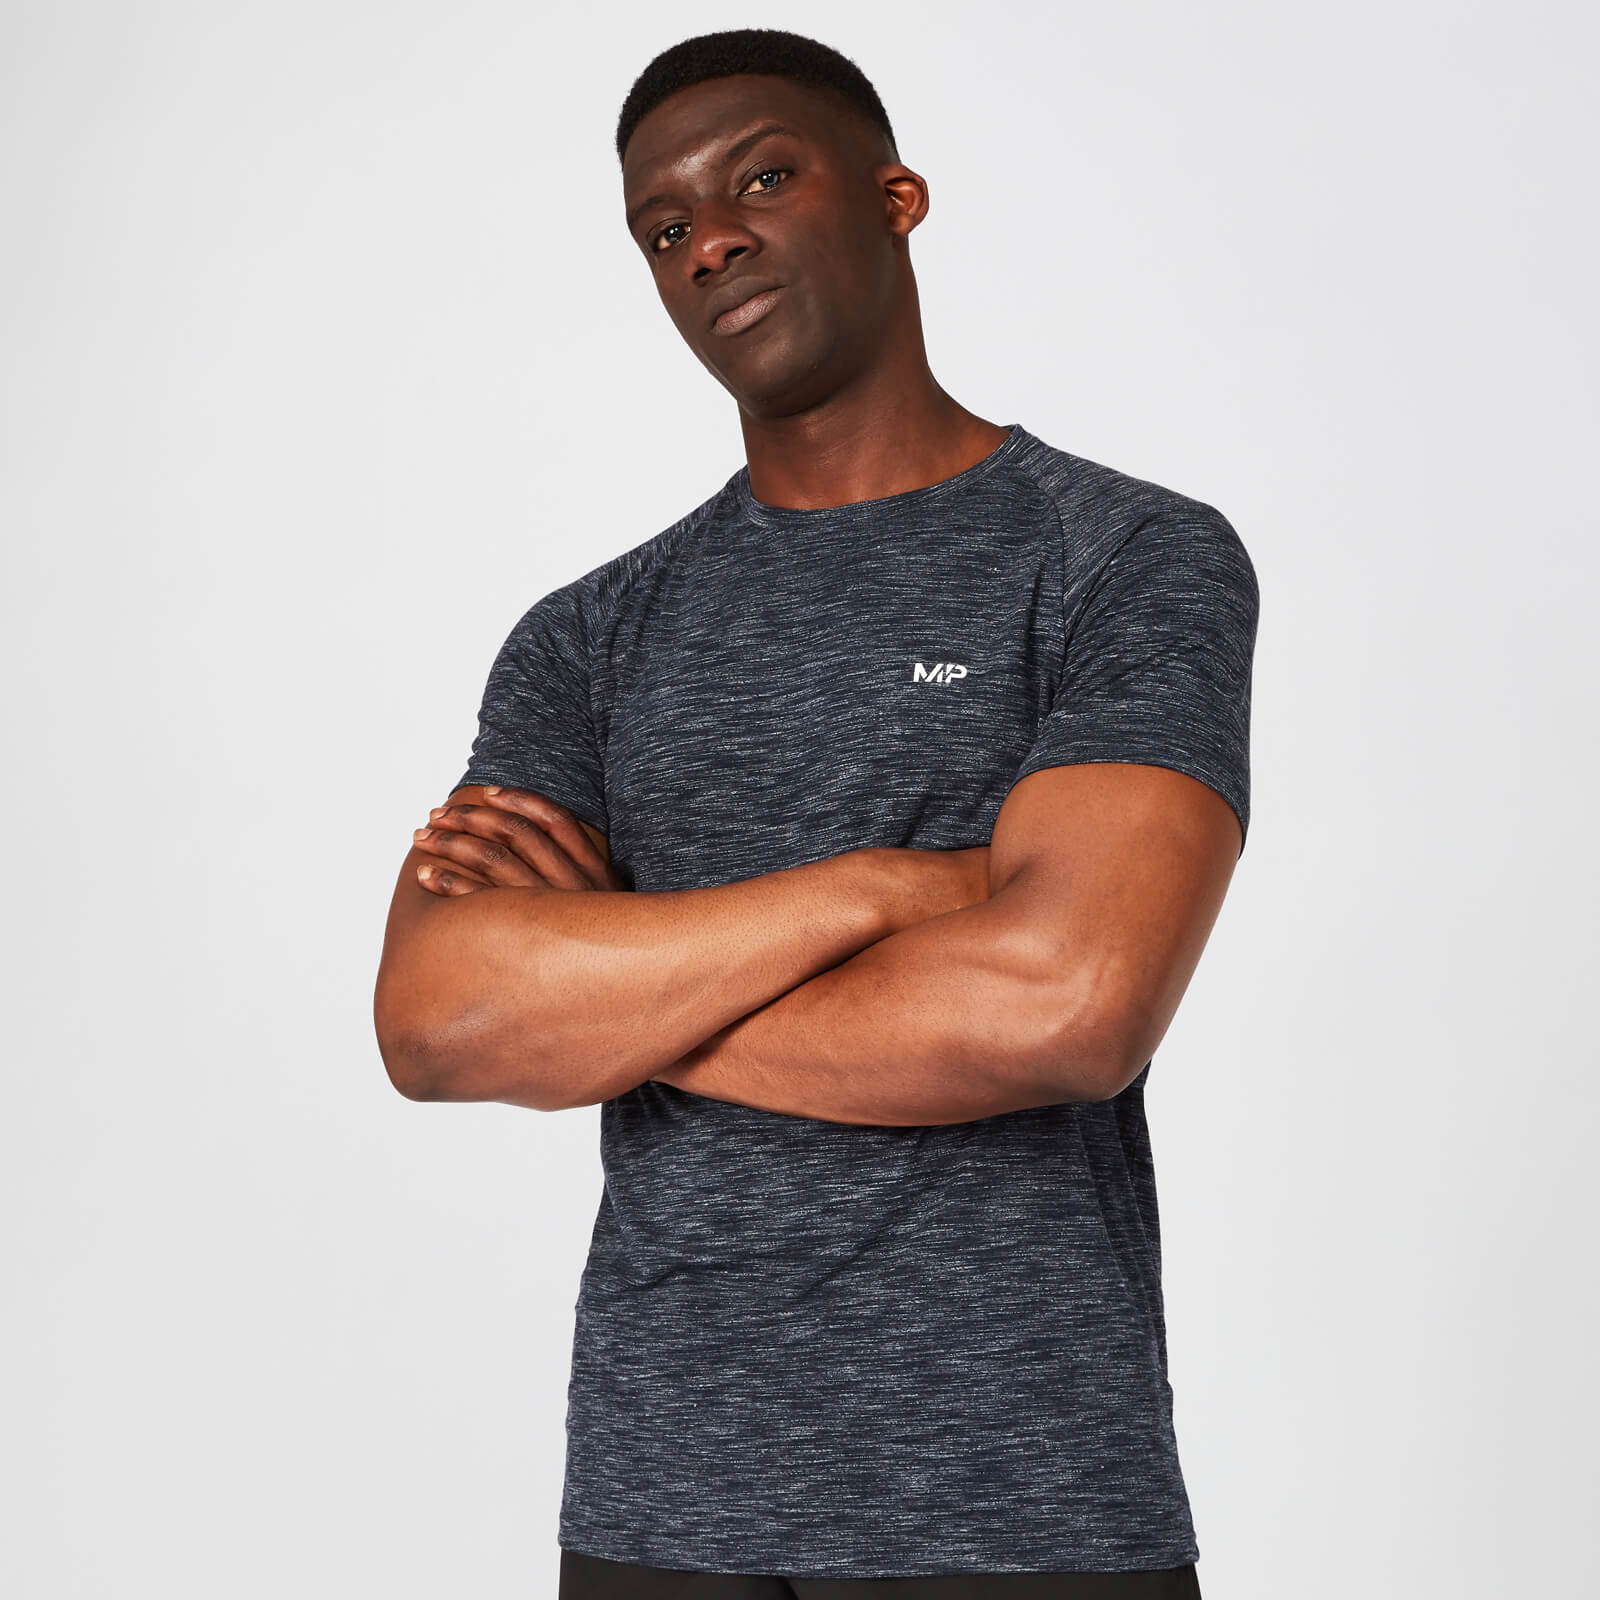 MP Performance T-Shirt - XS